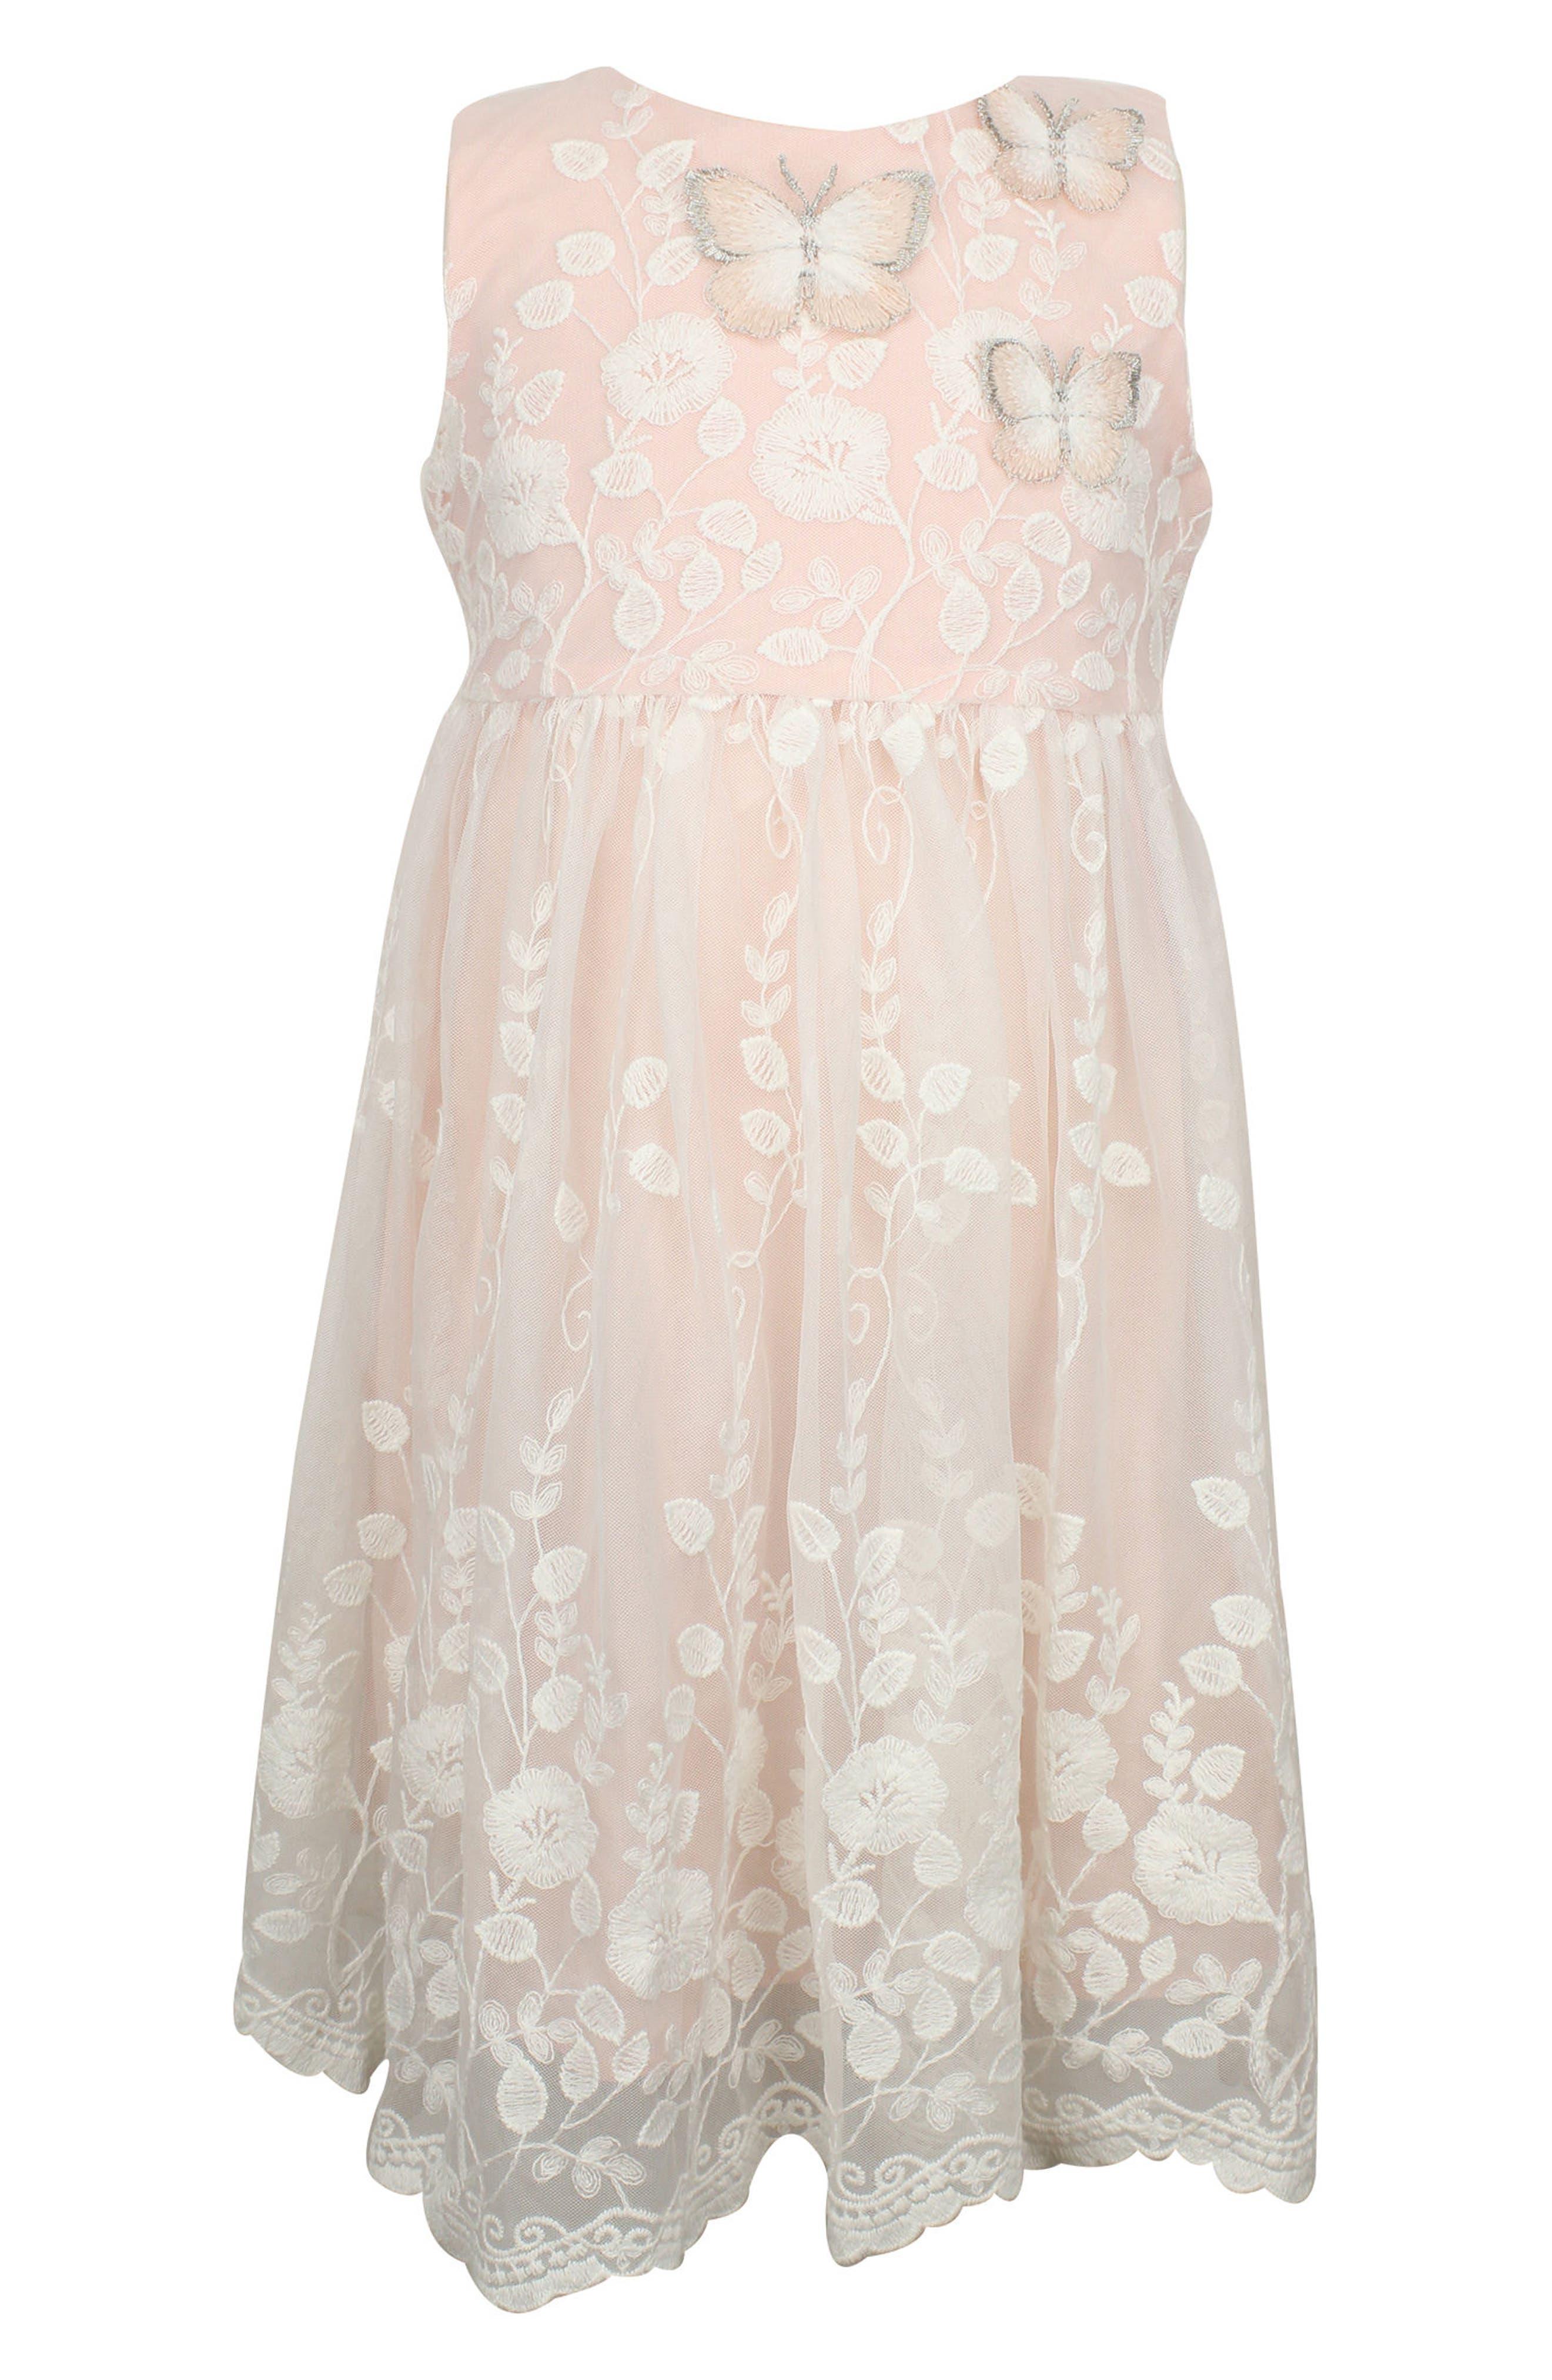 Lace Overlay Sleeveless Dress,                             Main thumbnail 1, color,                             IVORY